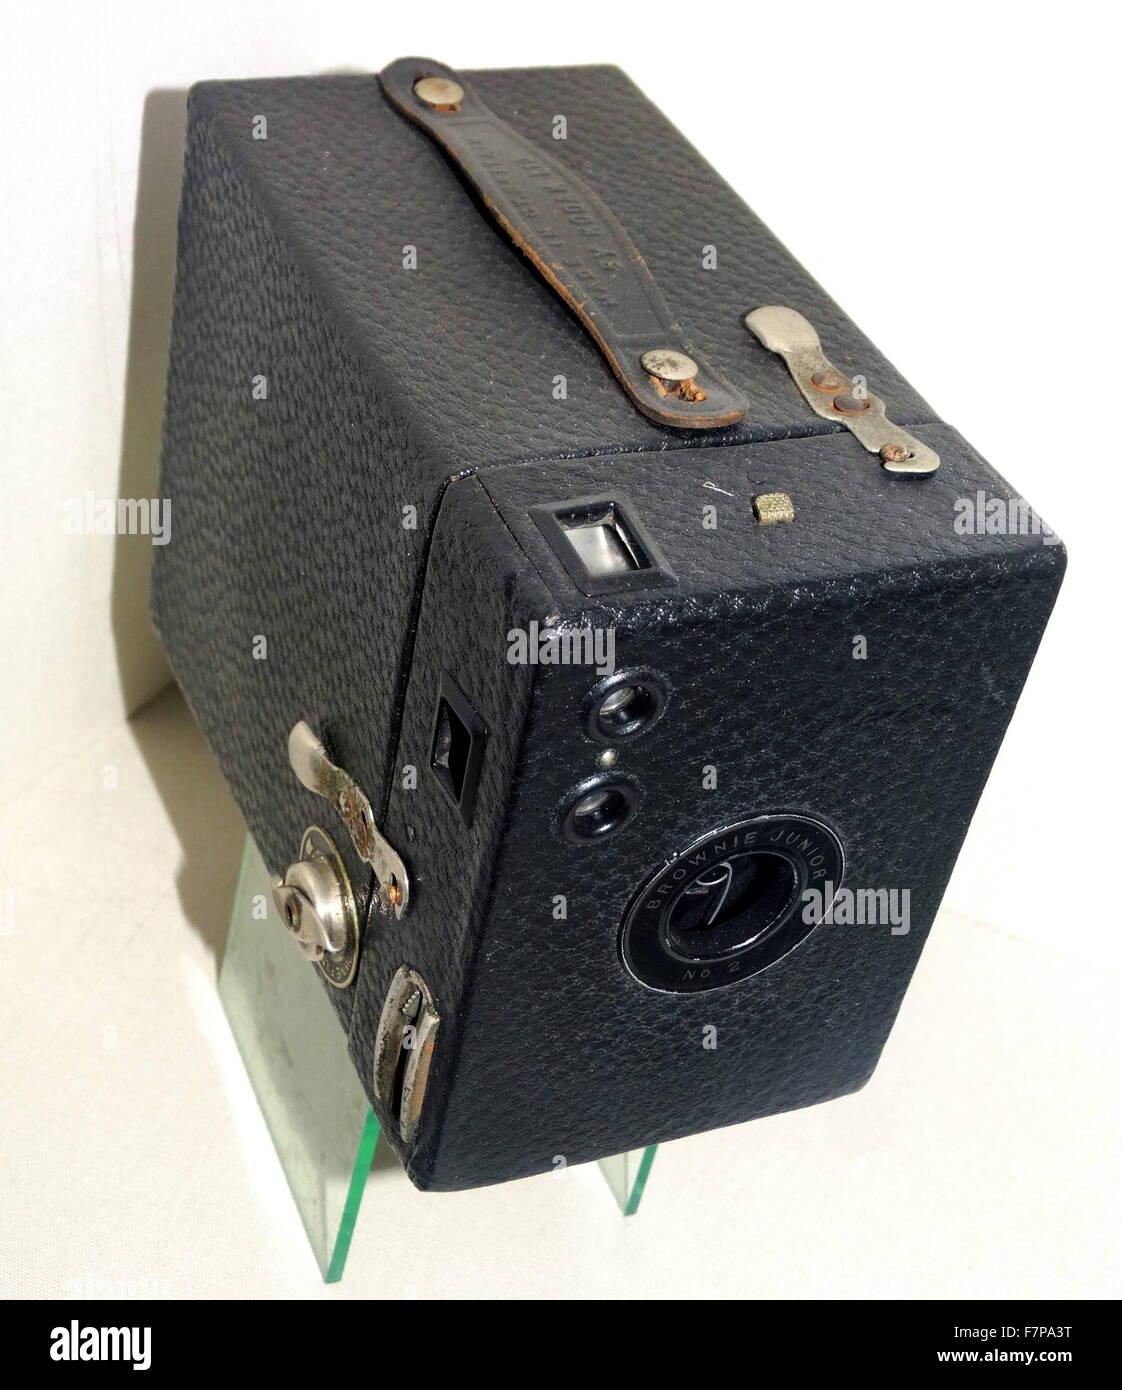 Kodak Box Brownie Junior 2 Camera, Roll film camera Made in England circa 1935 - Stock Image